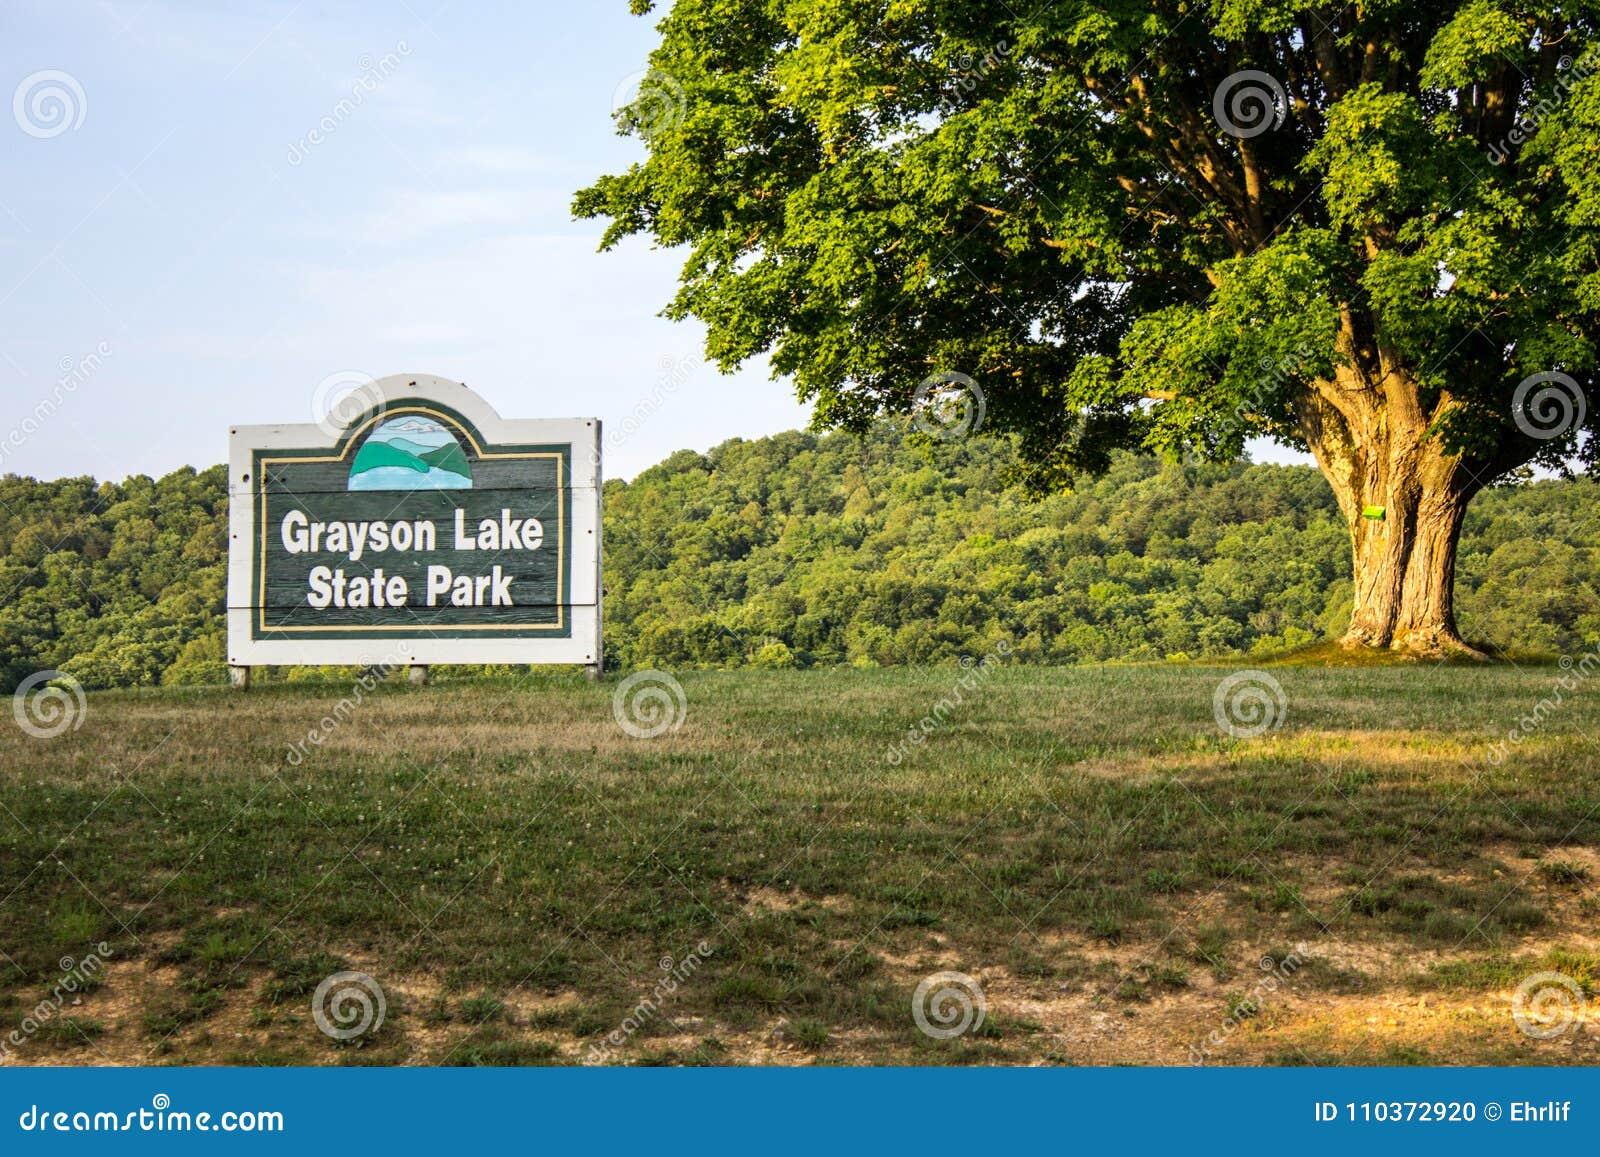 Grayson Lake State Park In Kentucky